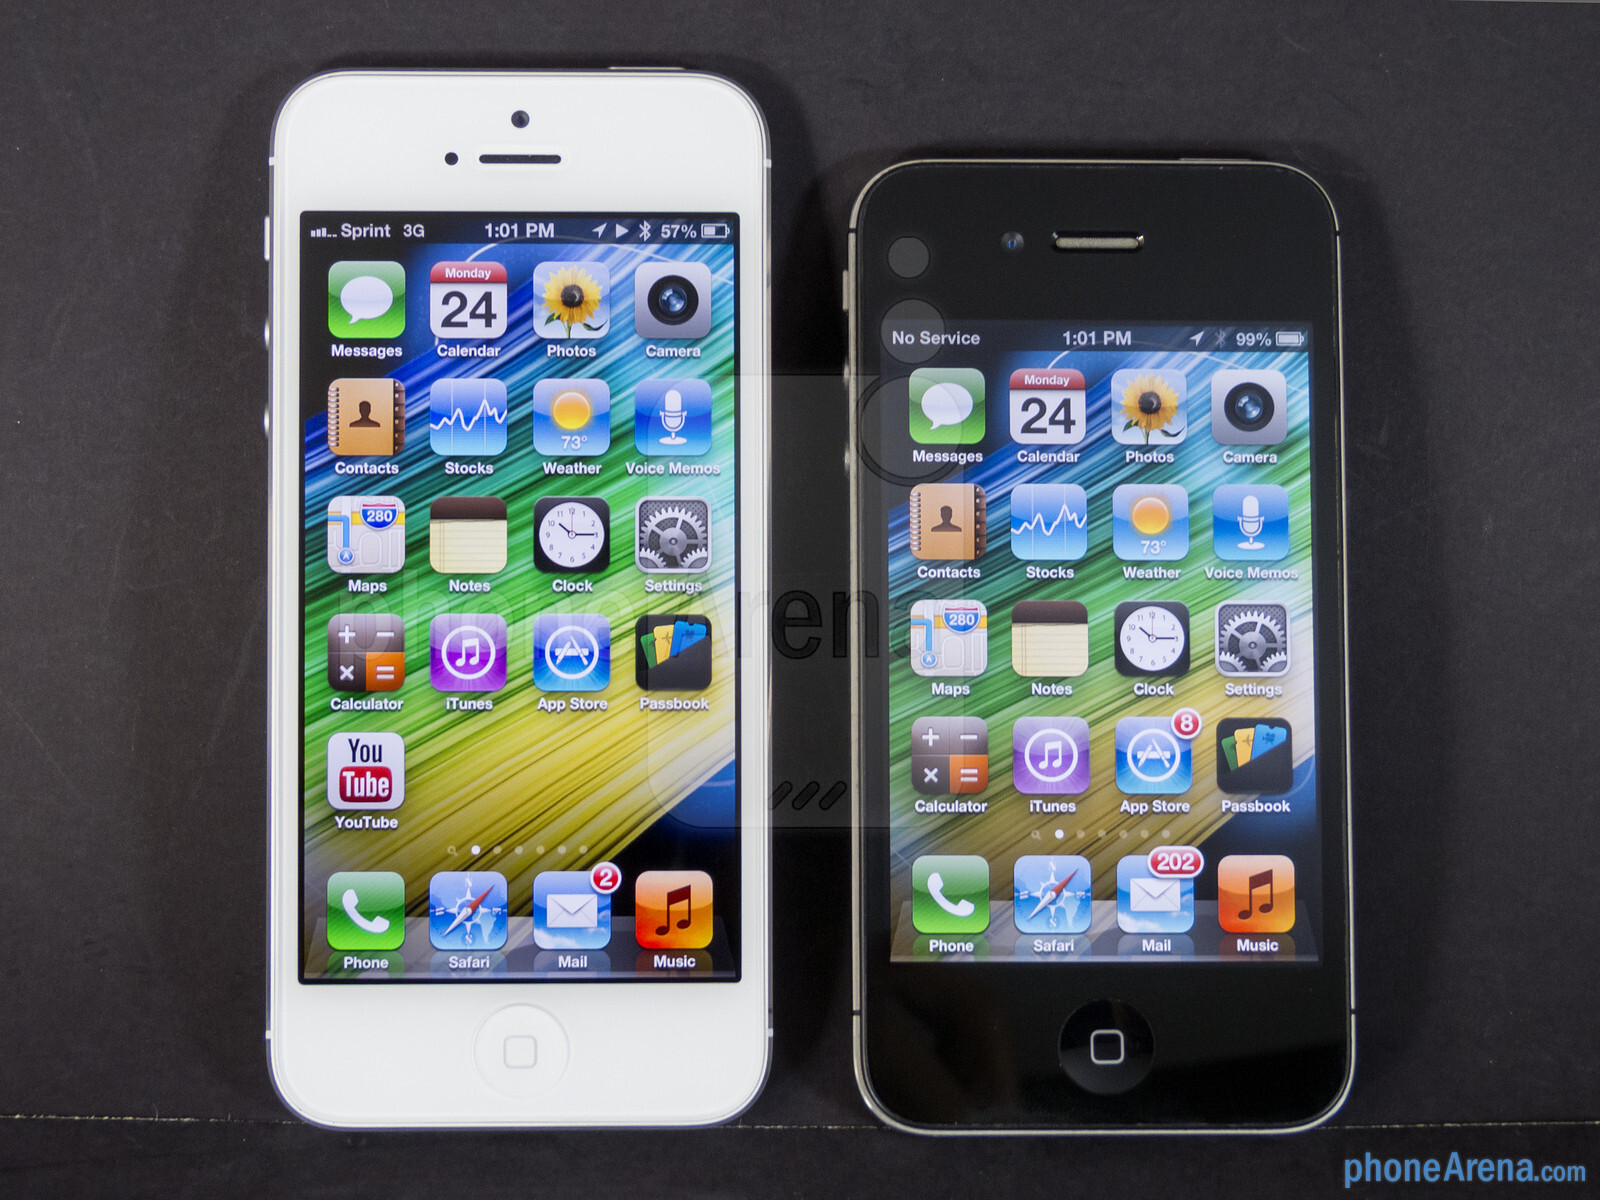 Apple Iphone Photo Apple Iphone 4s Photos